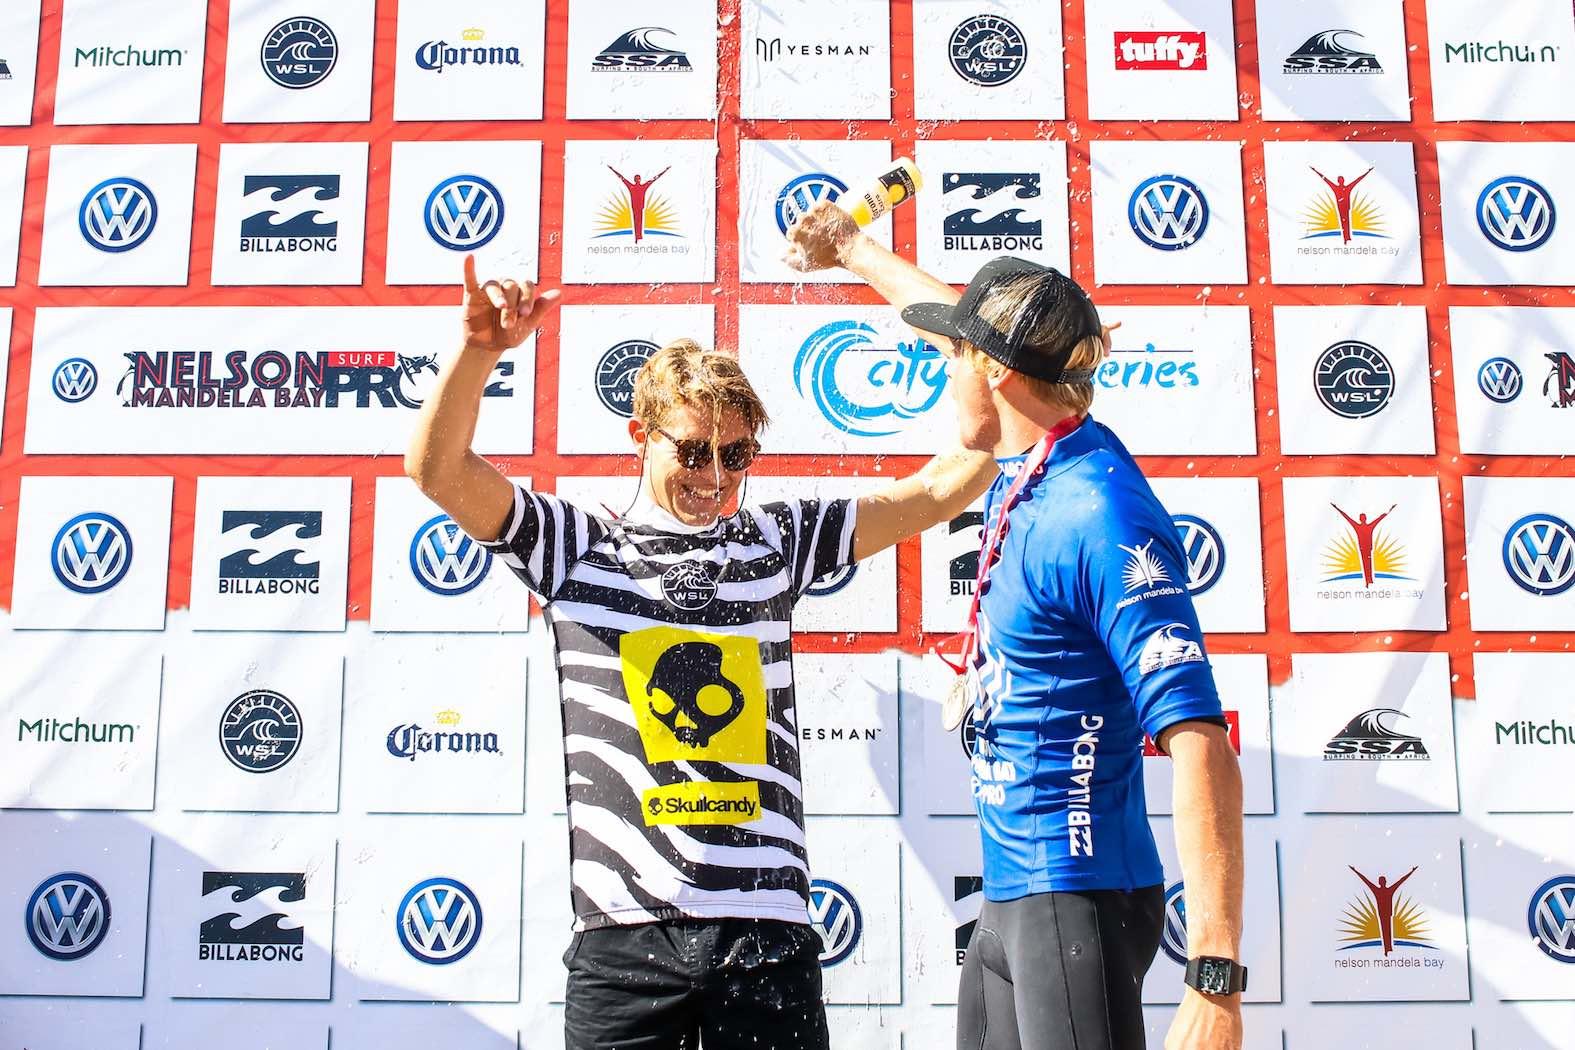 Volkswagen Nelson Mandela Bay Surf Pro Mens Final podium